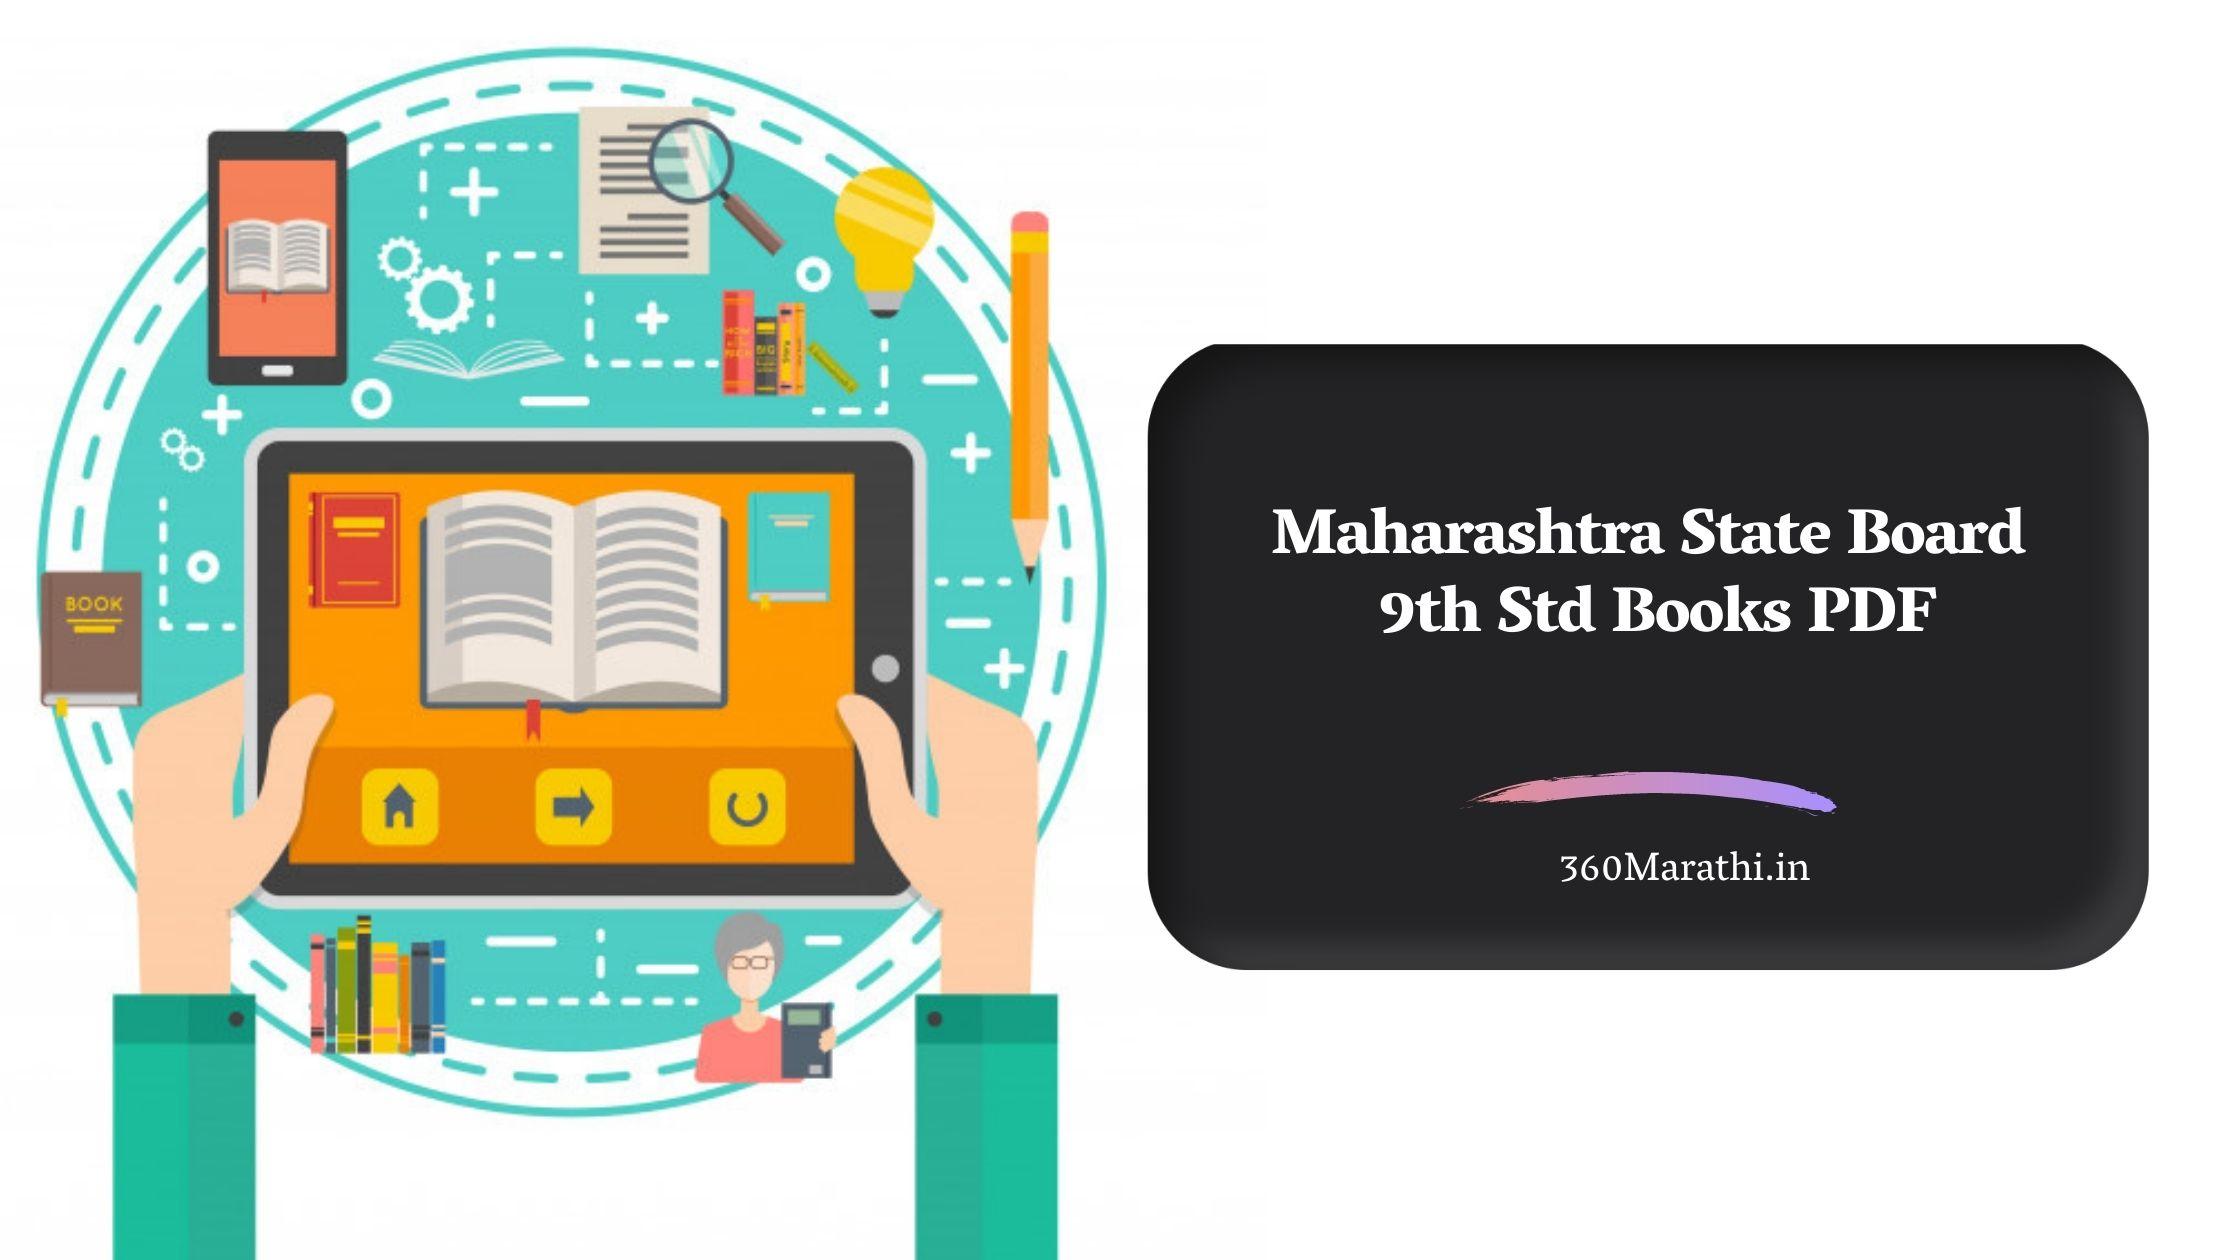 Maharashtra State Board 9th Std Books PDF Free Download